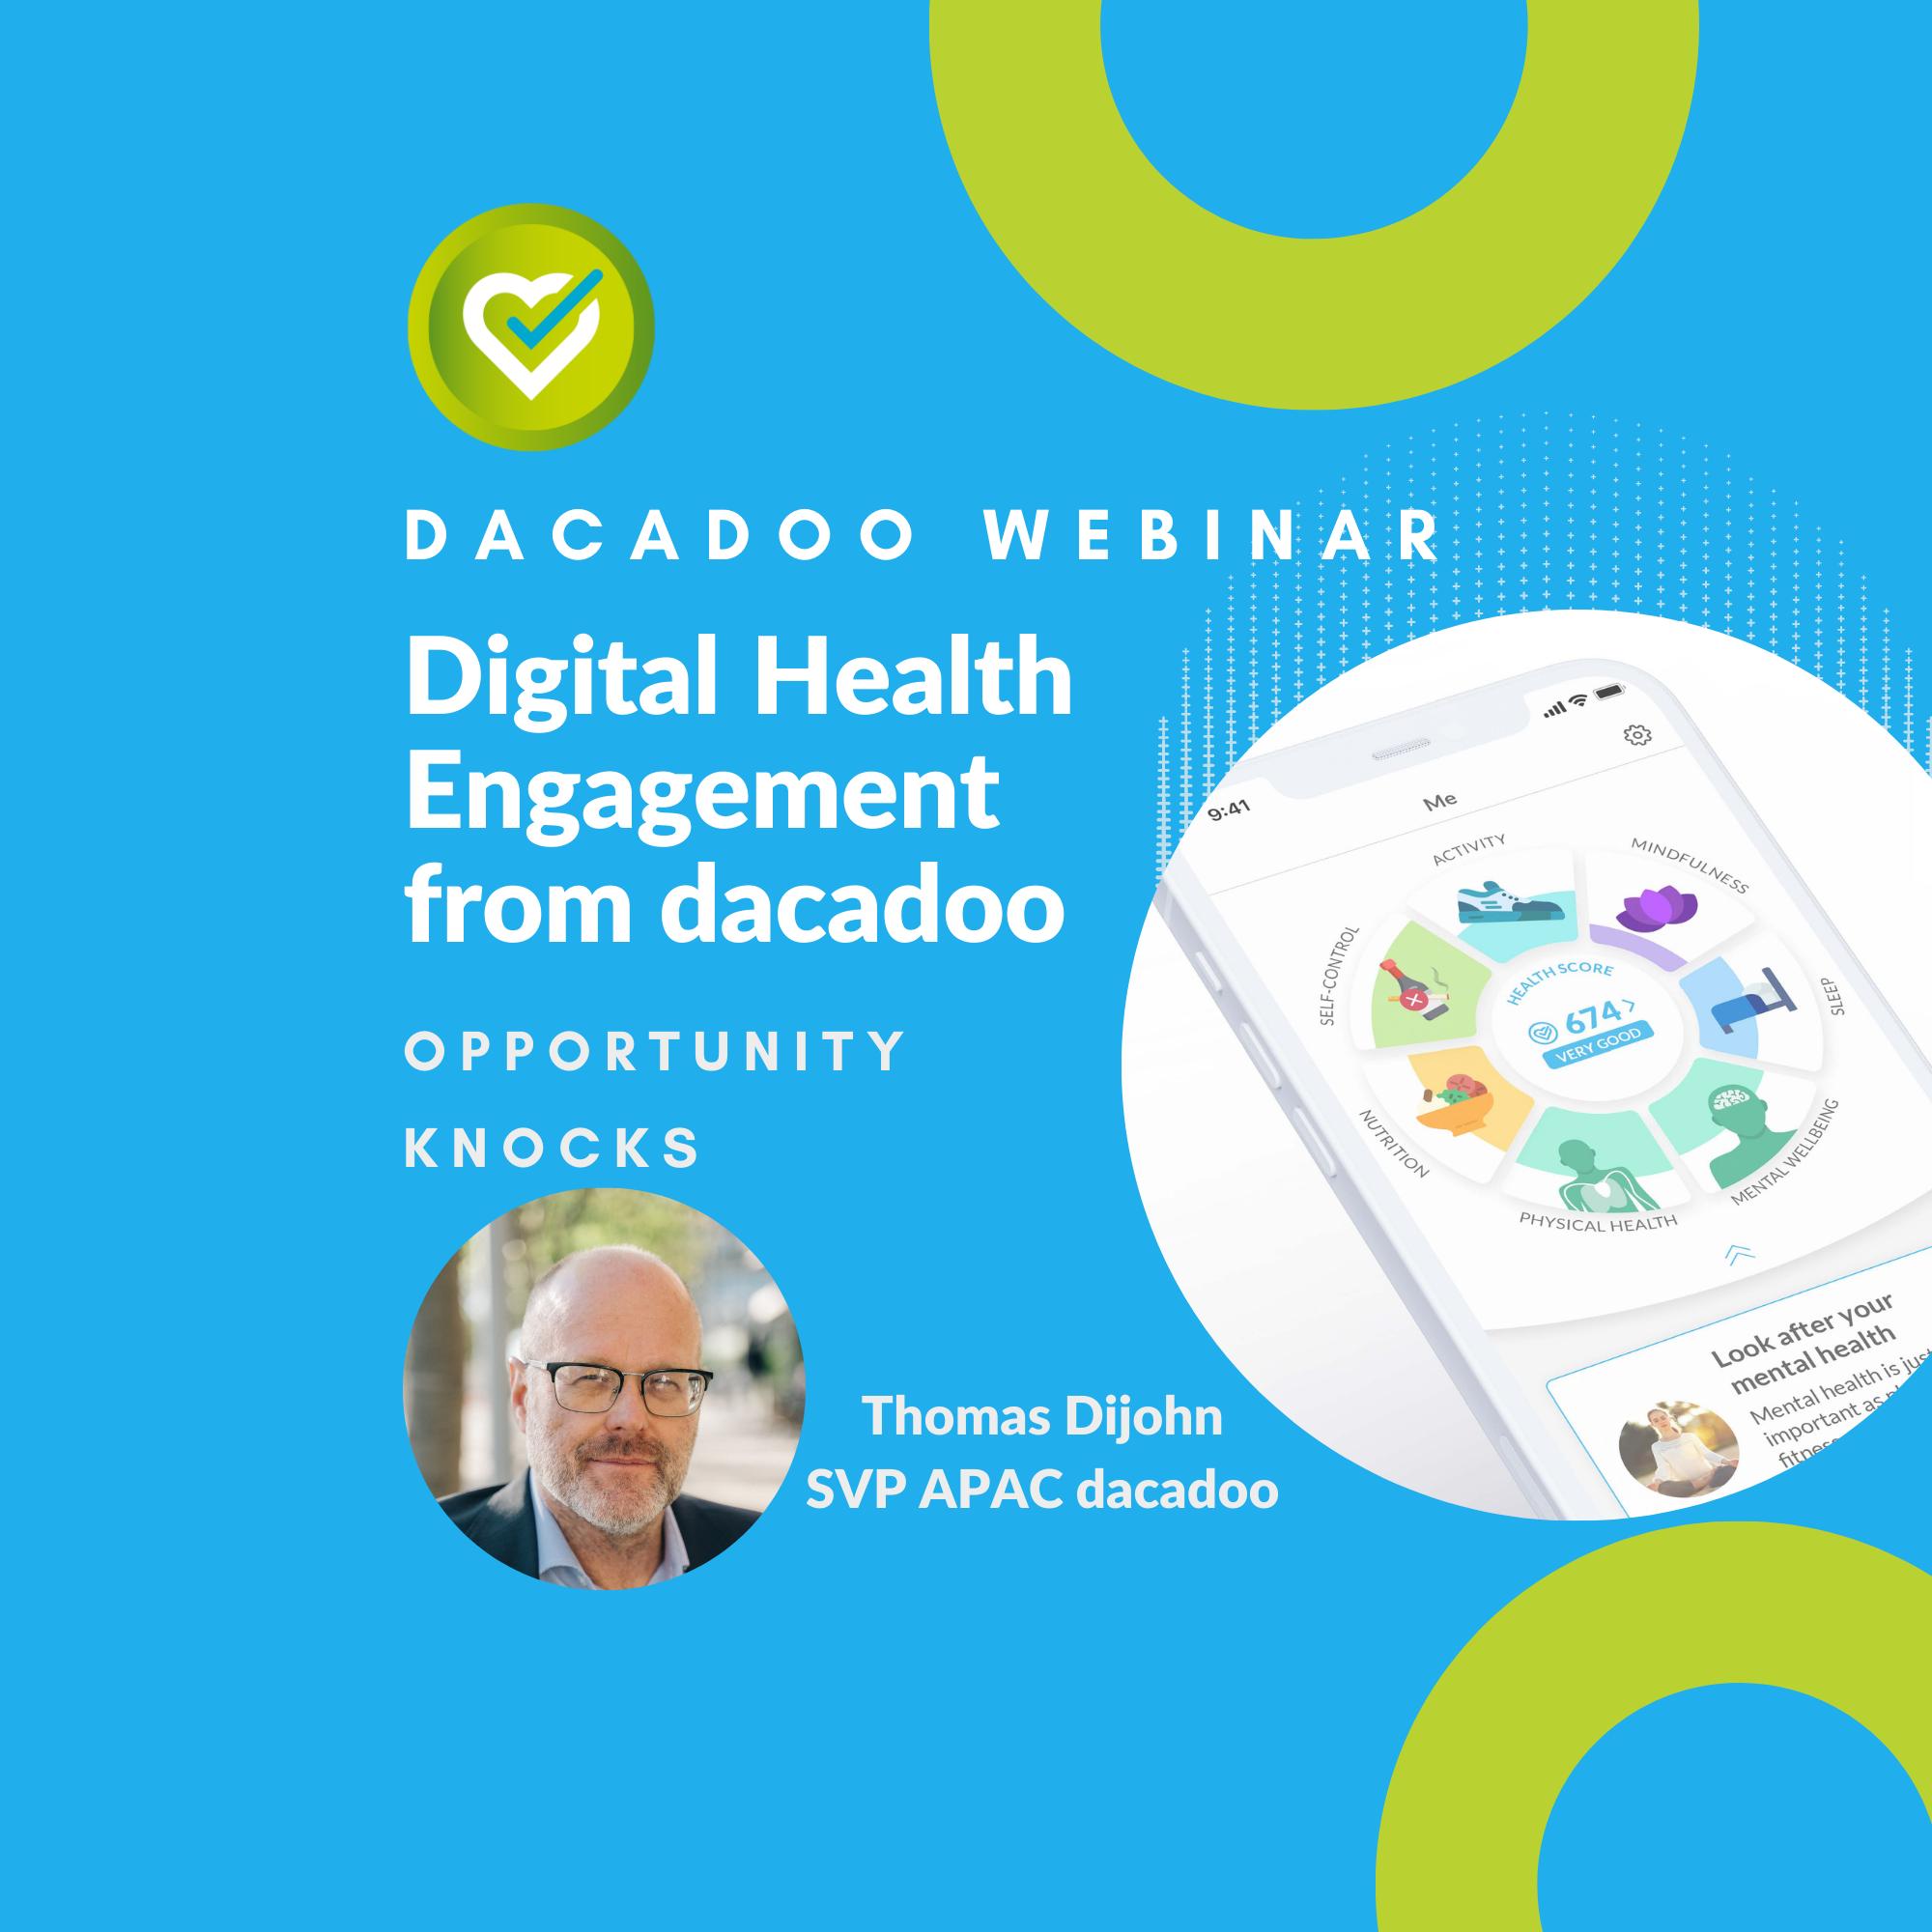 dacadoo webinar| Digital Health Engagement from dacadoo – opportunity knocks